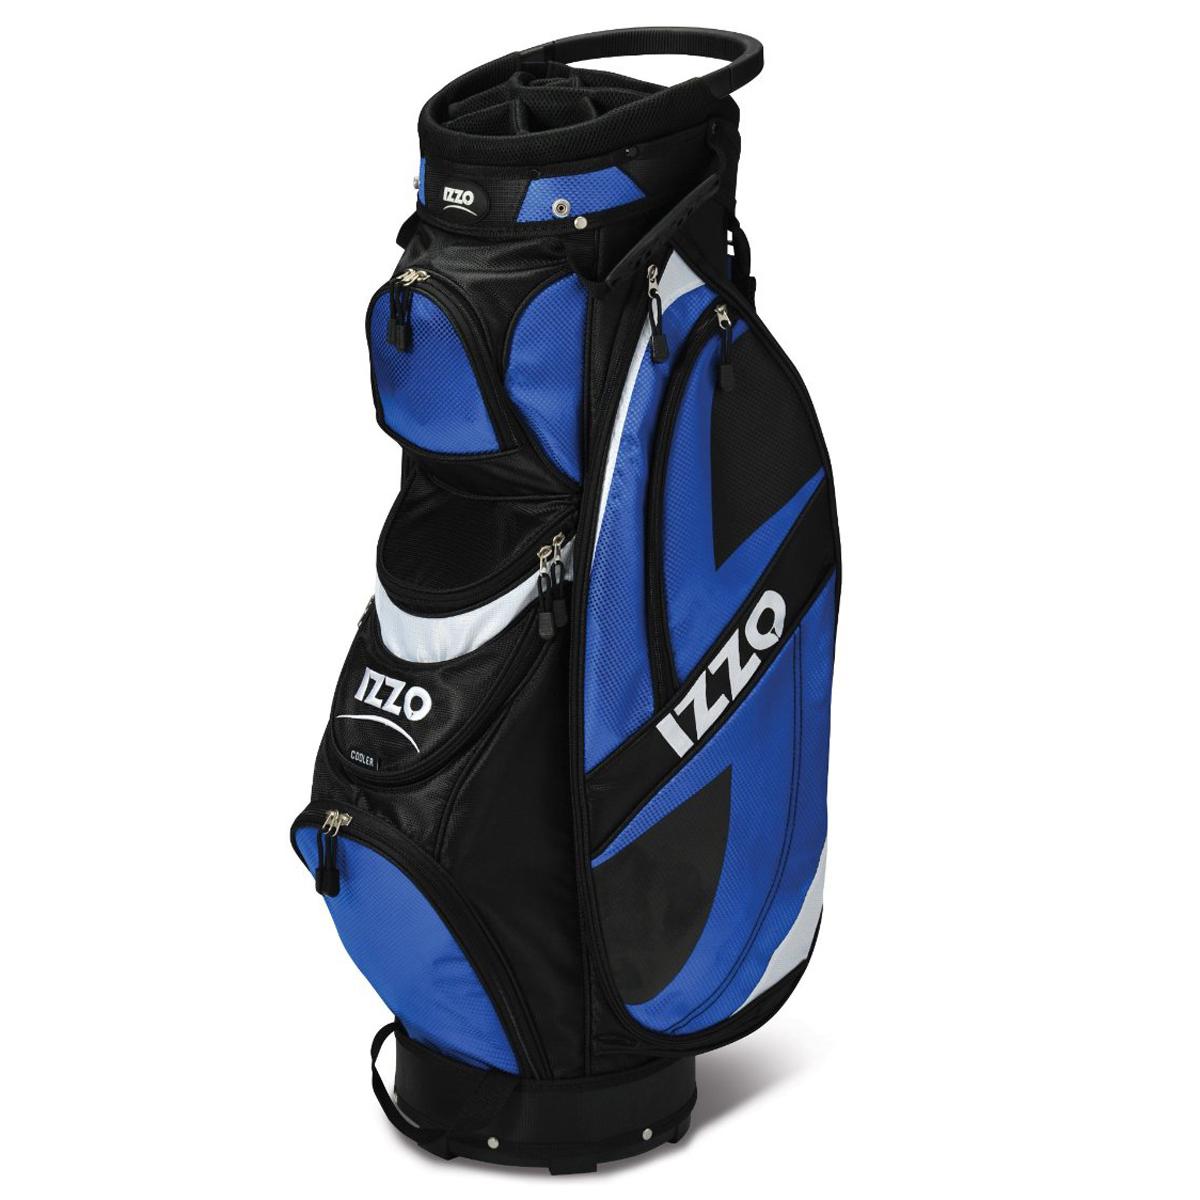 Izzo Breeze Deluxe Ultra Light Push Cart Golf Bag Ebay